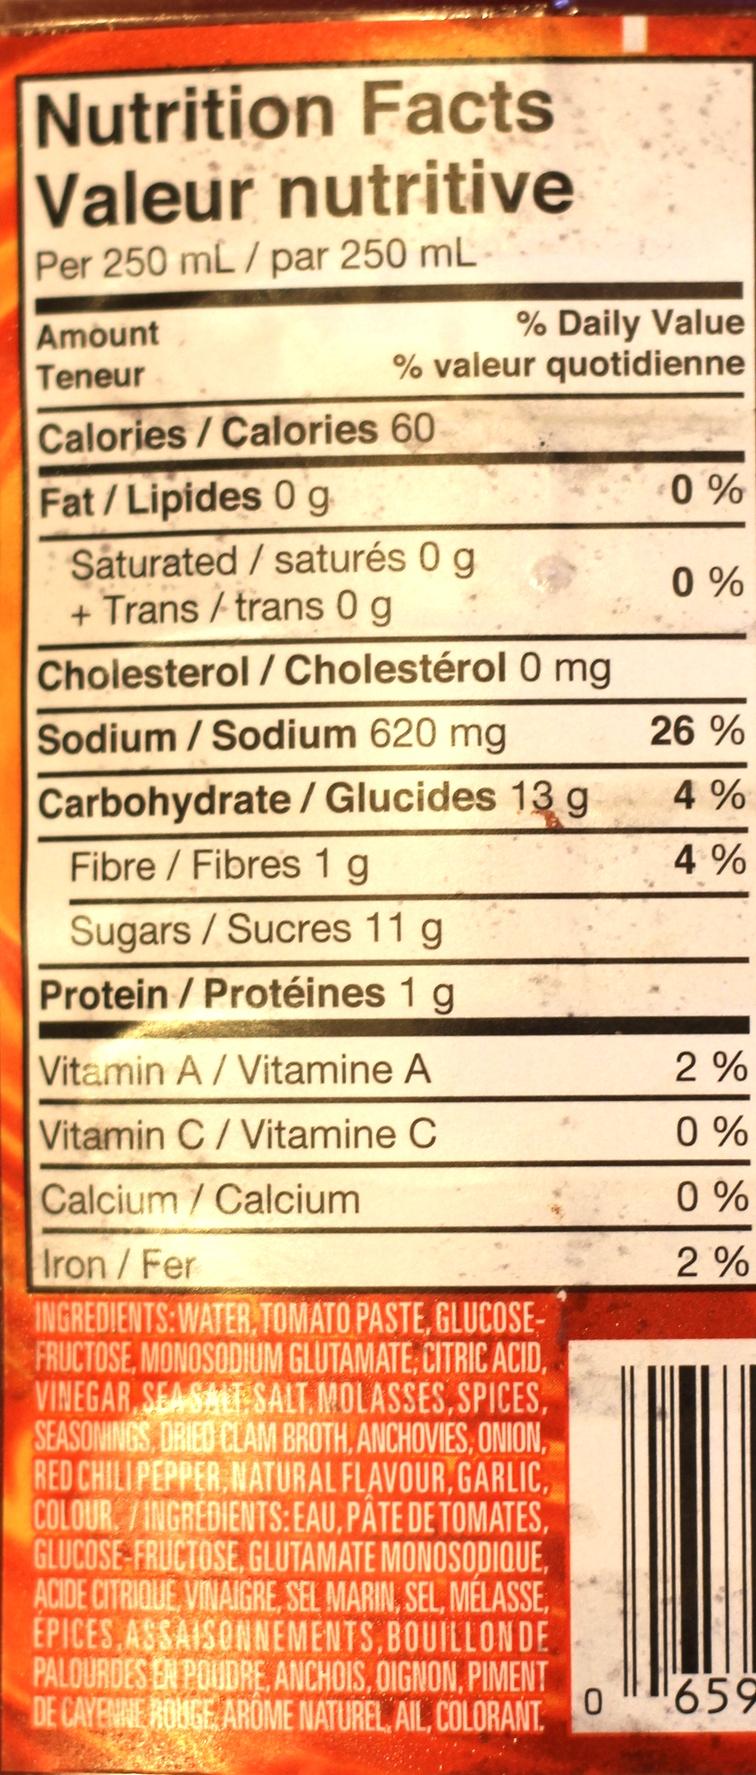 Mott's Clamato Nutrition Facts table